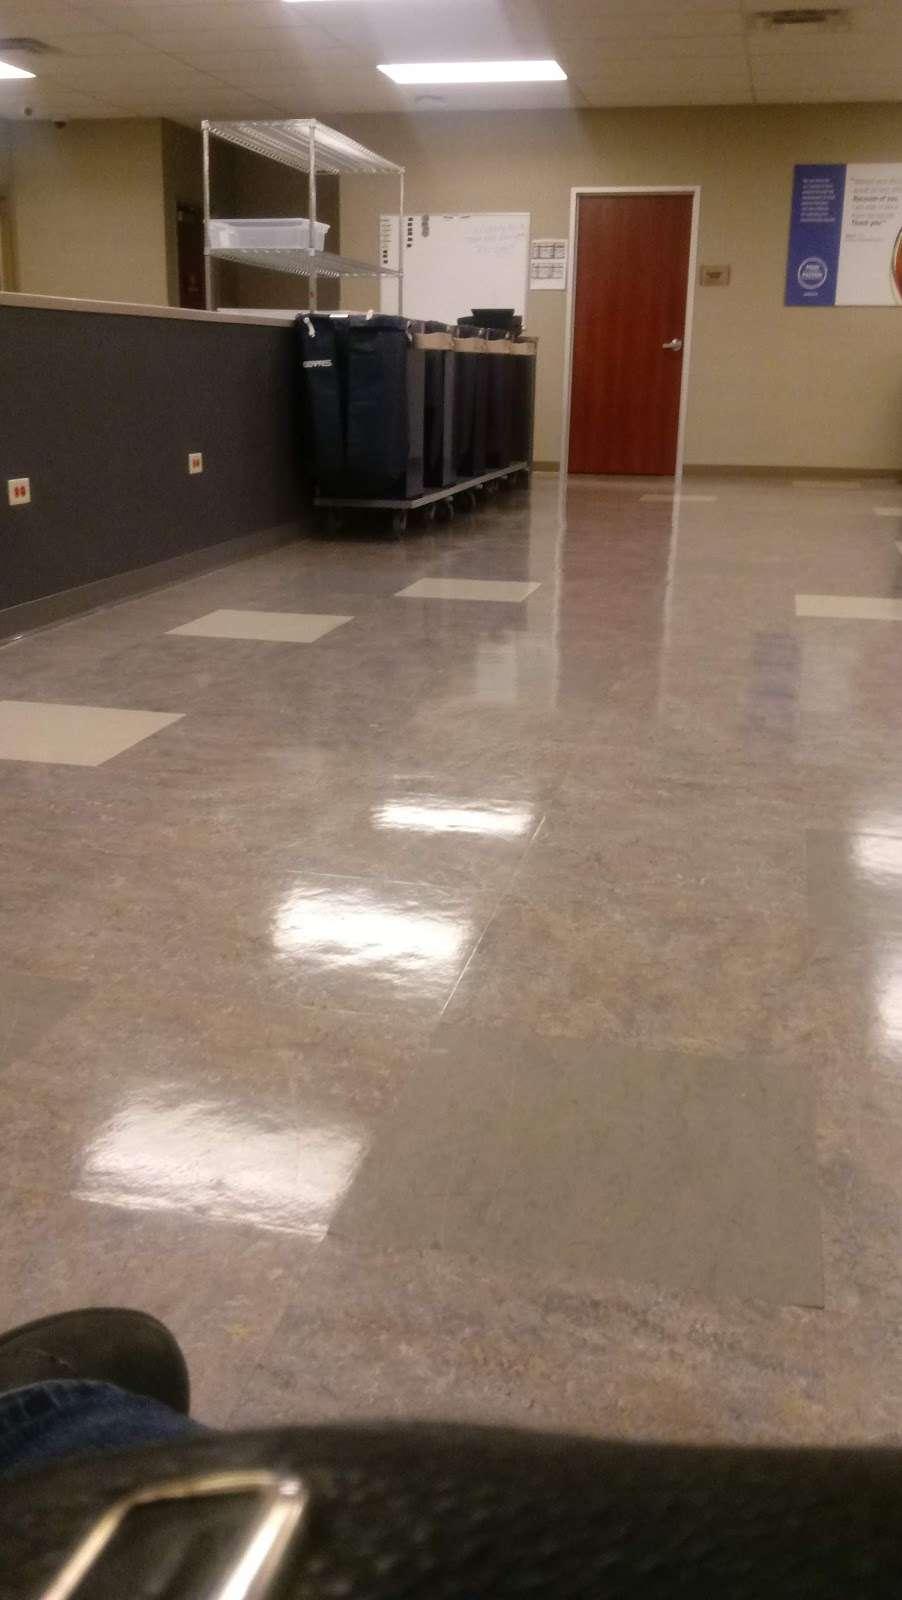 Biomat USA - hospital  | Photo 8 of 10 | Address: 2159 E 95th St, Chicago, IL 60617, USA | Phone: (773) 374-2449